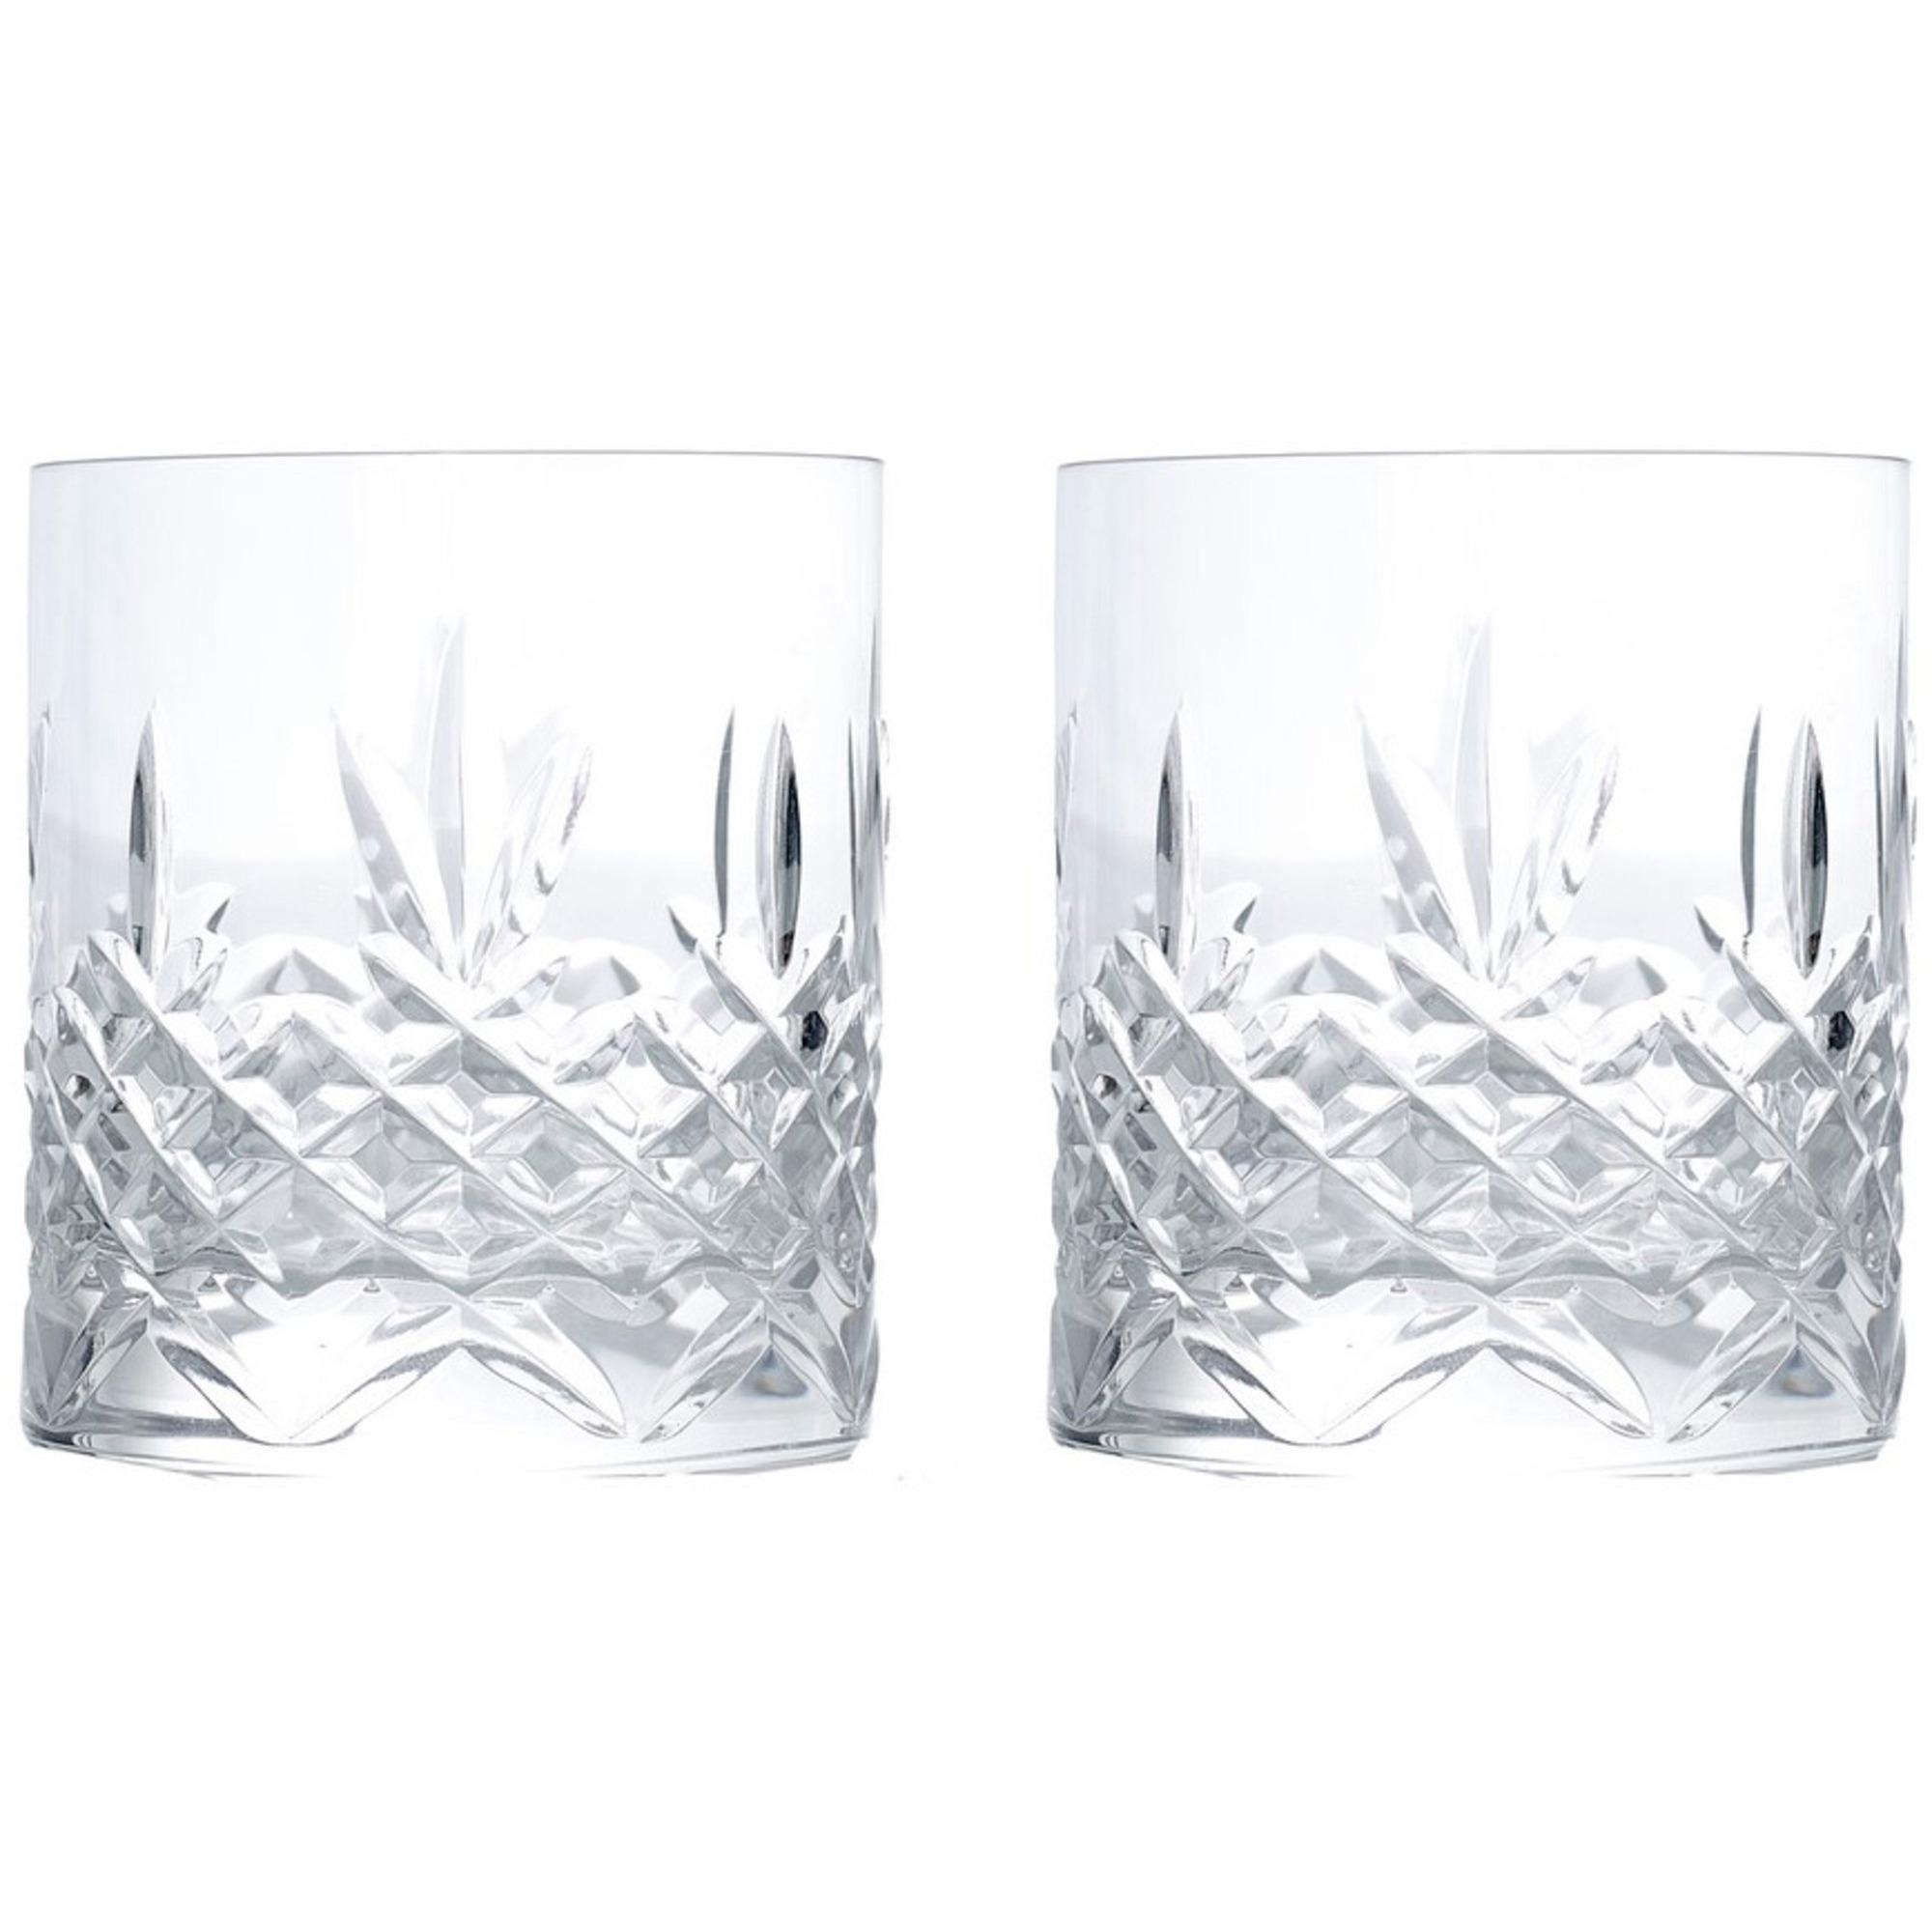 Frederik Bagger Crispy Lowball whiskyglas 2 st.